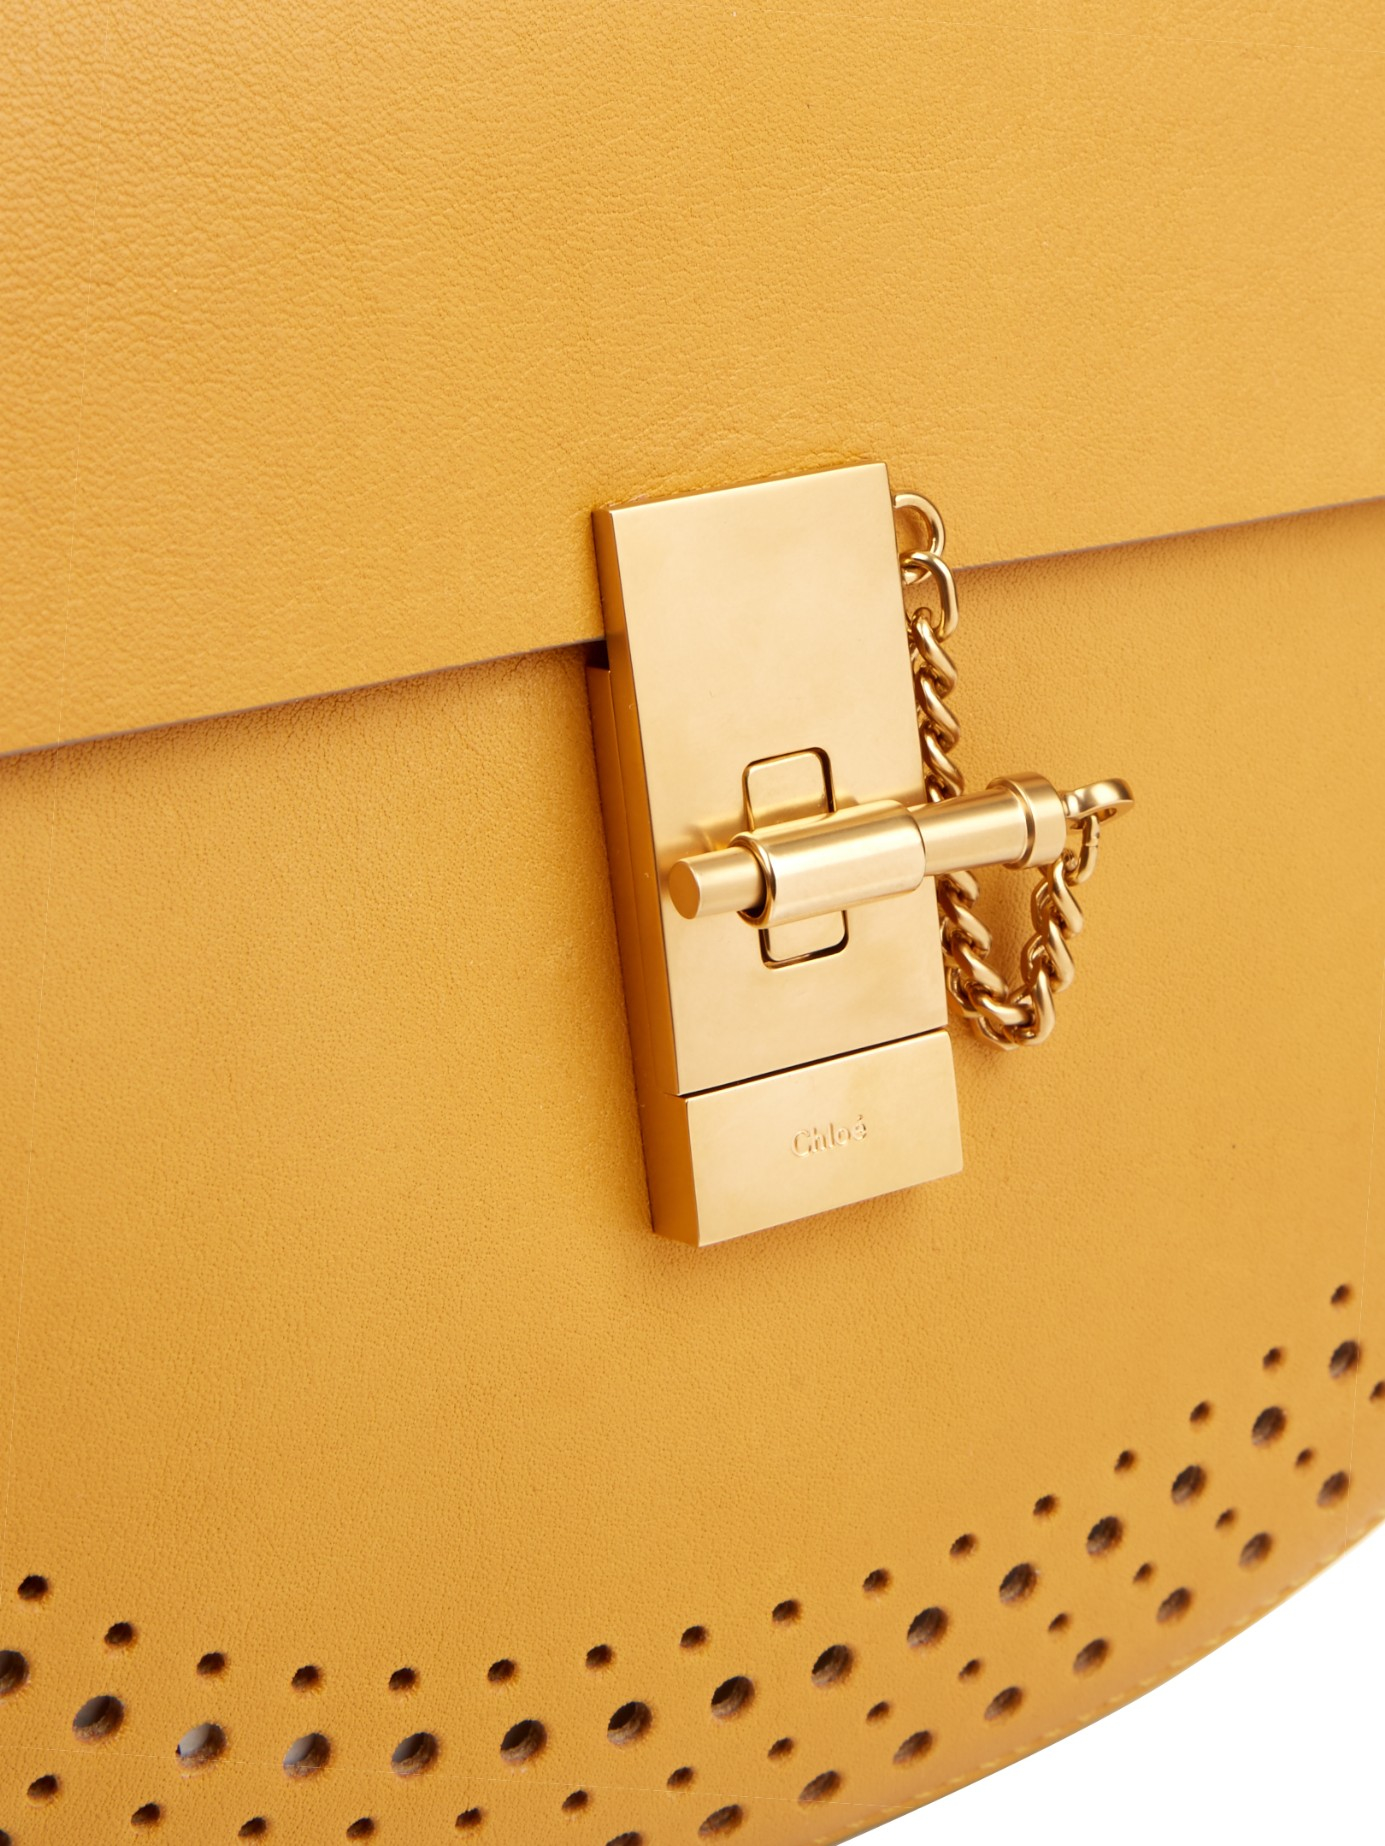 chloe elsie shoulder bag - Chlo�� Drew Small Leather Cross-Body Bag in Yellow | Lyst